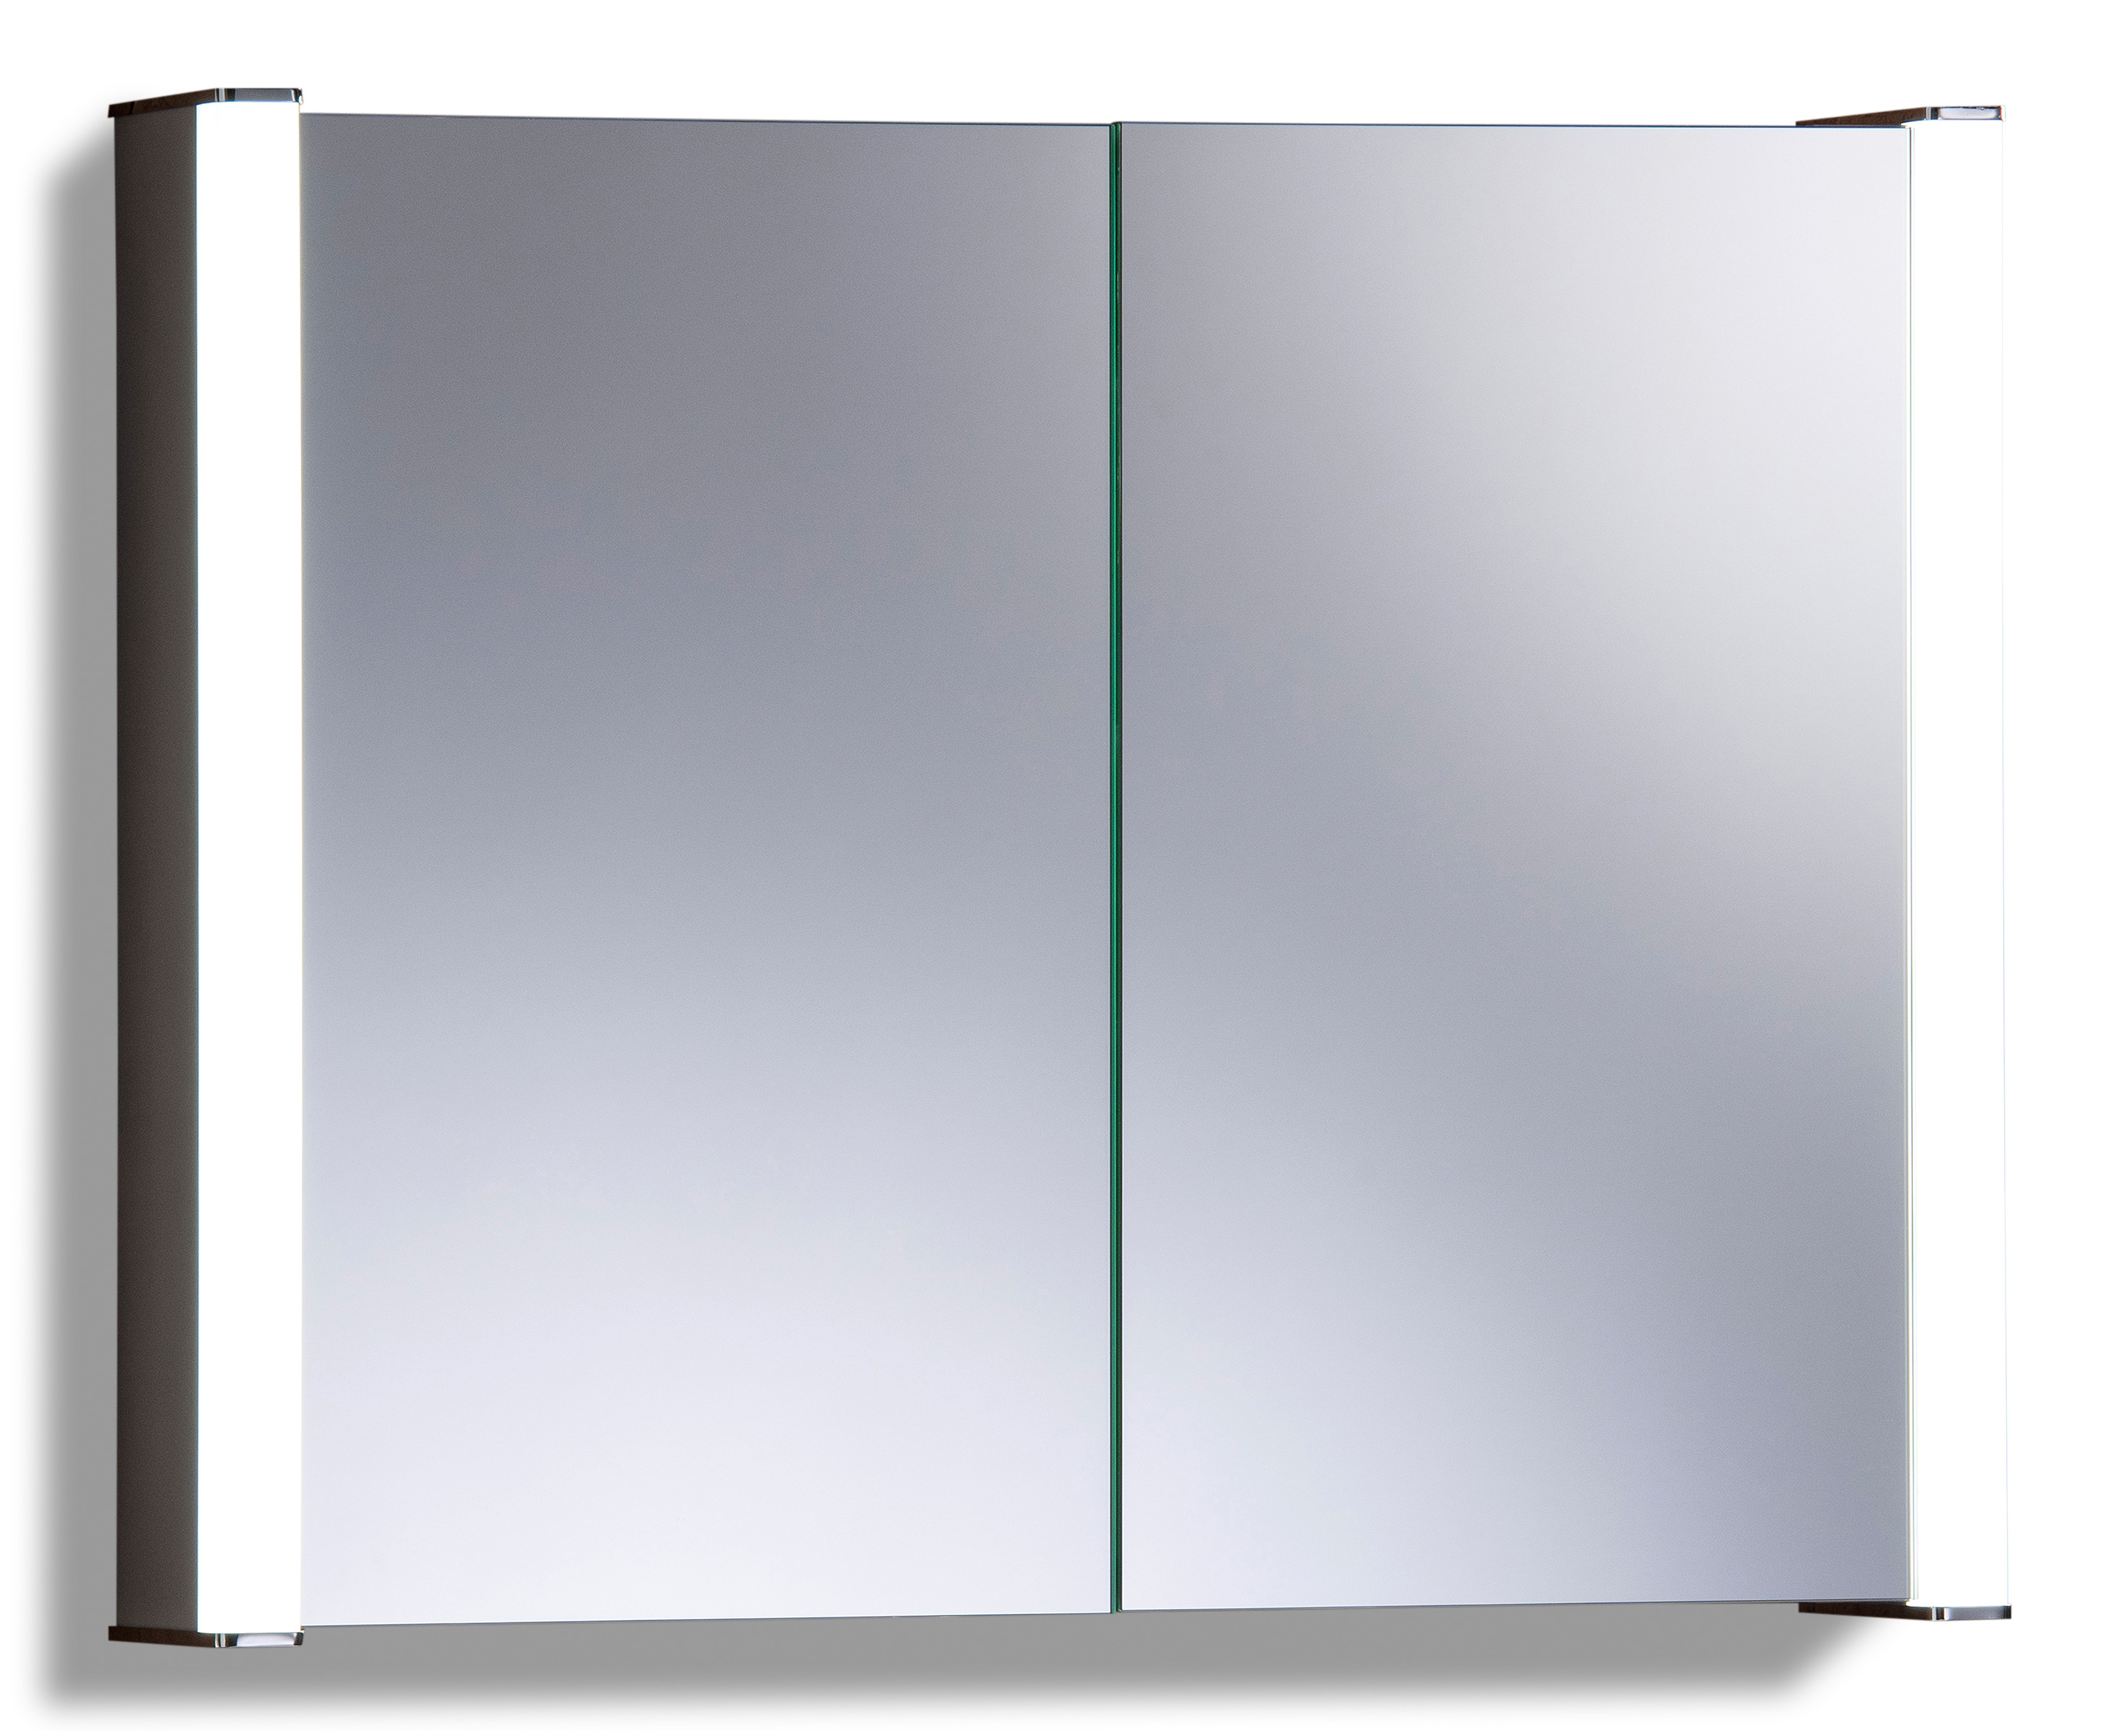 Illuminated Mirror Glass Cabinet: LED Illuminated Bathroom MIRROR CABINET Demister Shaver